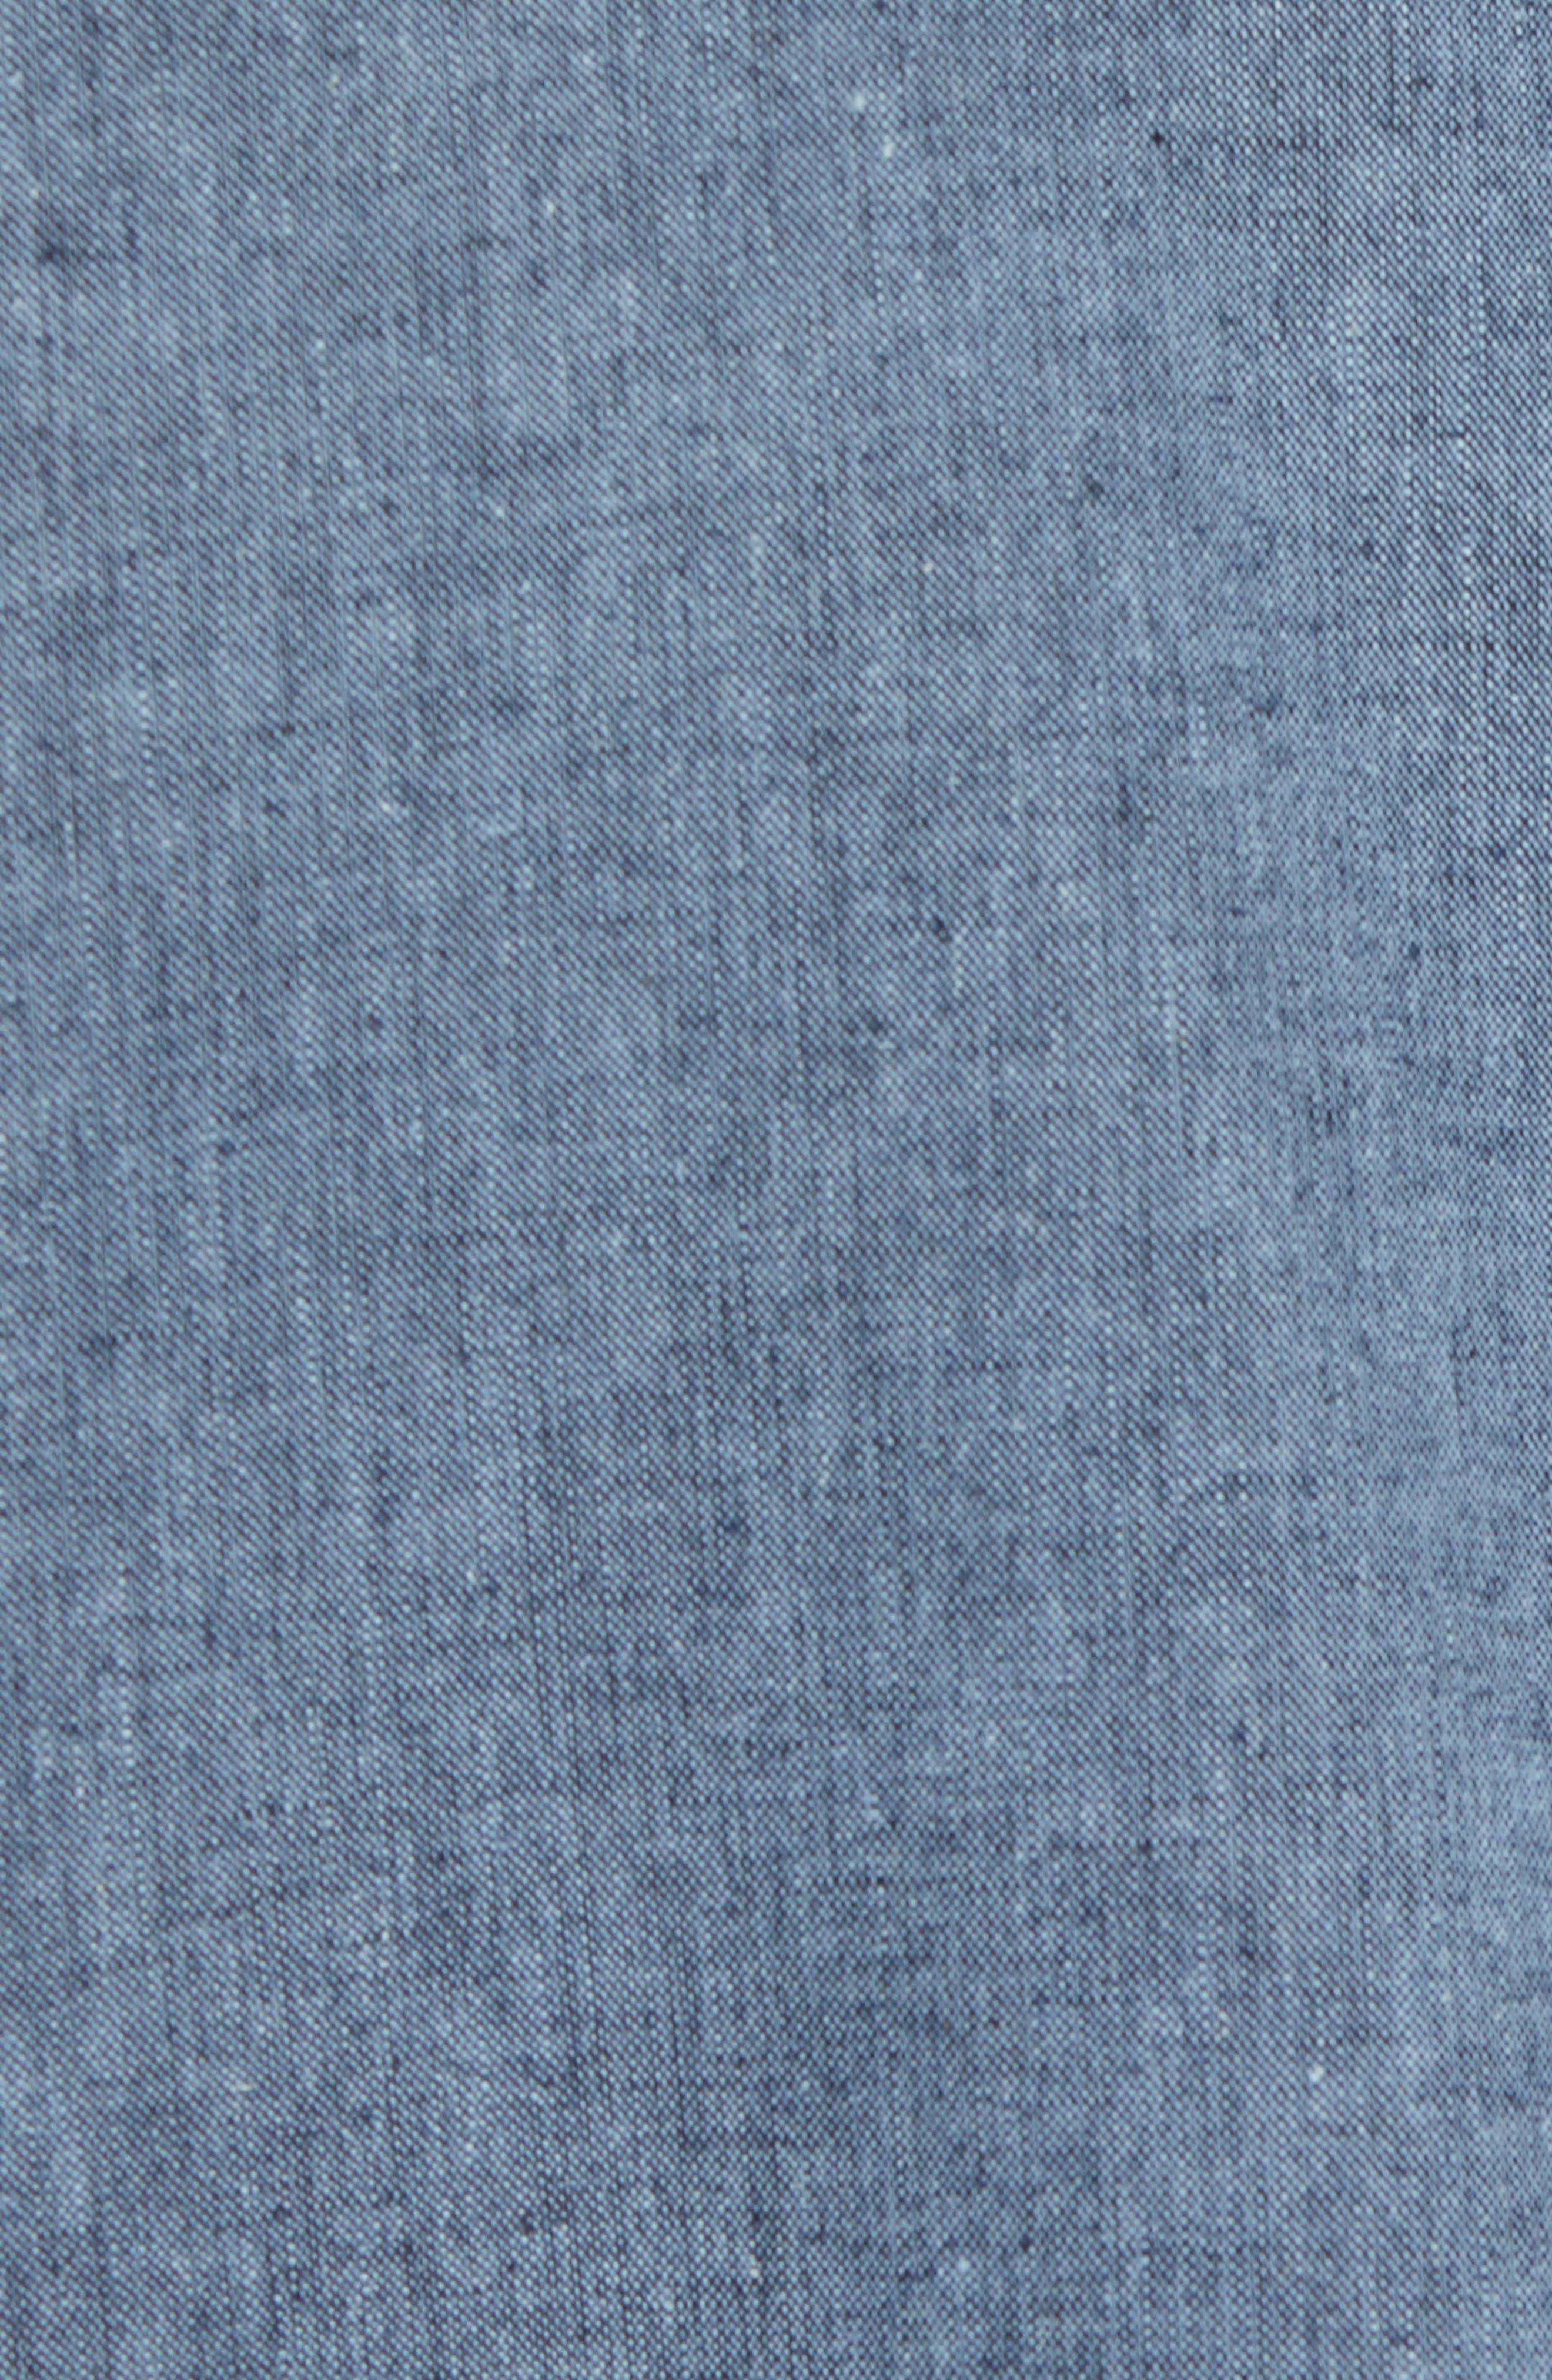 Linen & Cotton Chambray Bomber Jacket,                             Alternate thumbnail 6, color,                             400